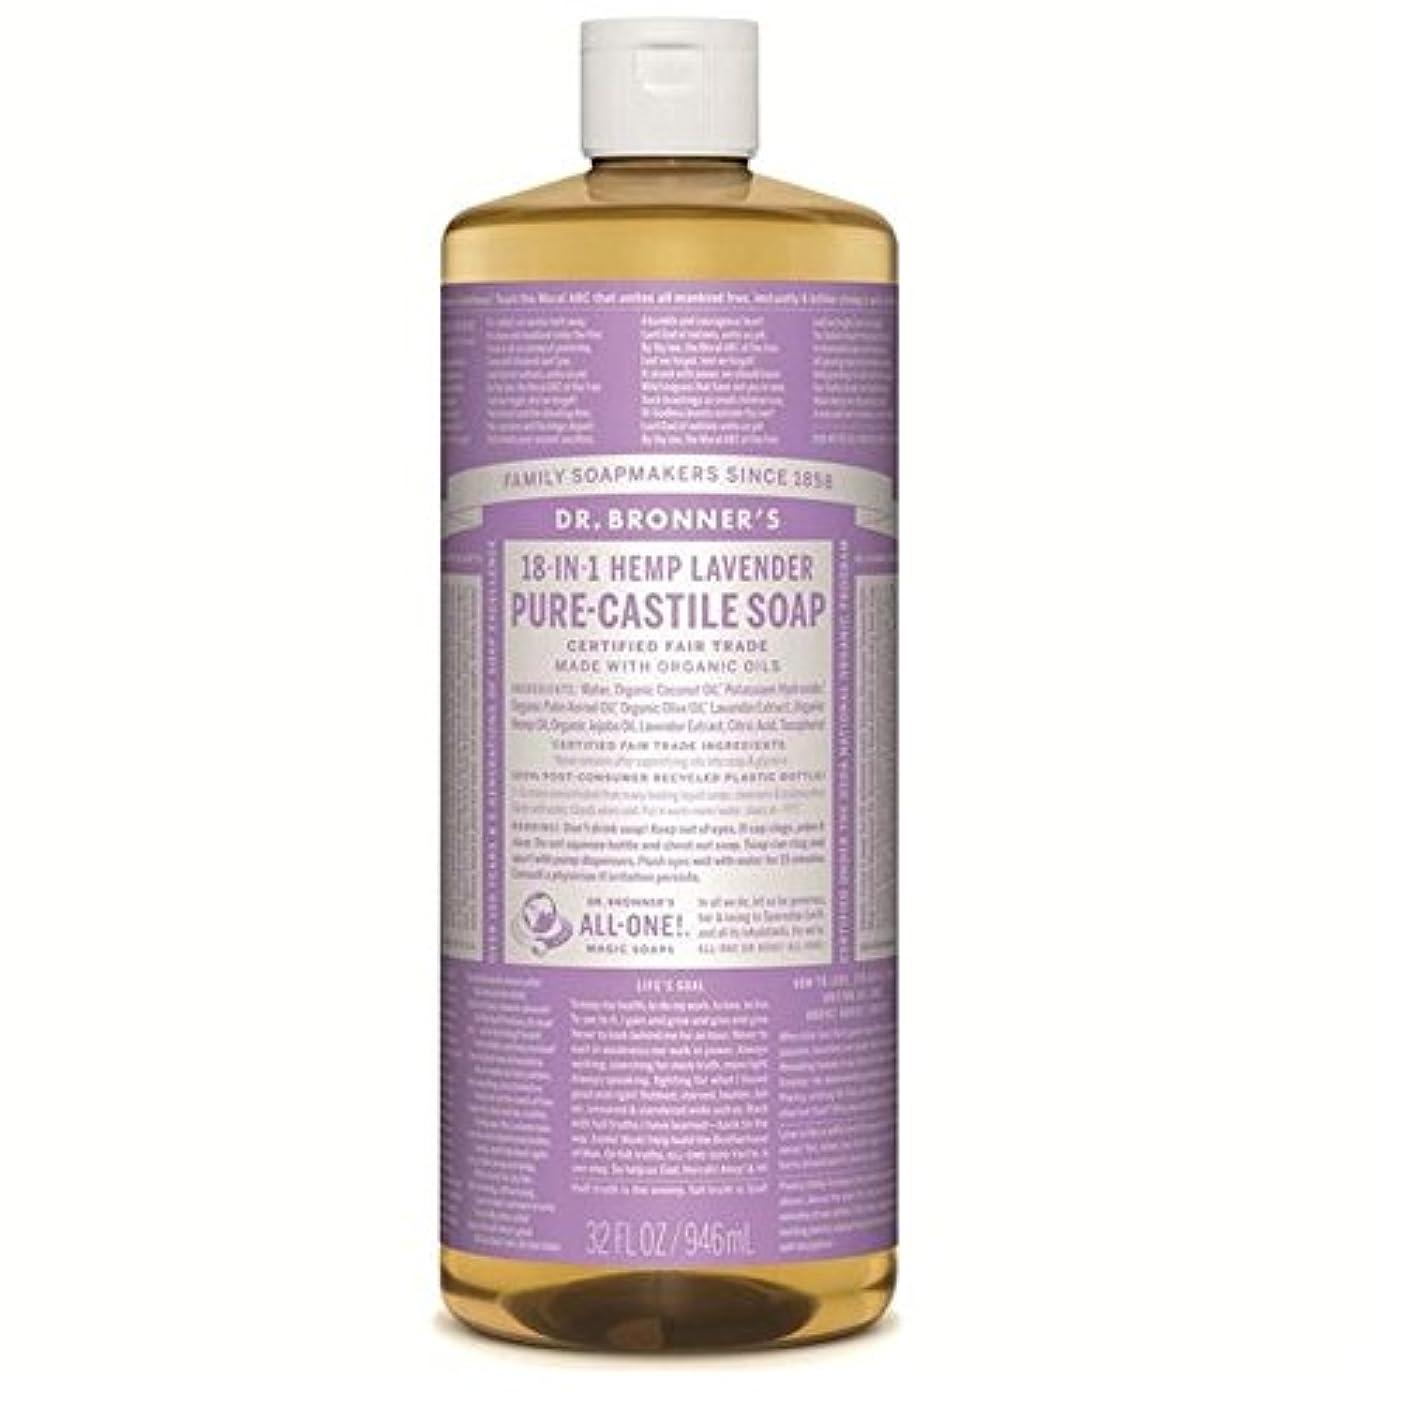 Dr Bronner Organic Lavender Castile Liquid Soap 946ml - のブロナー有機ラベンダーカスティーリャ液体石鹸946ミリリットル [並行輸入品]